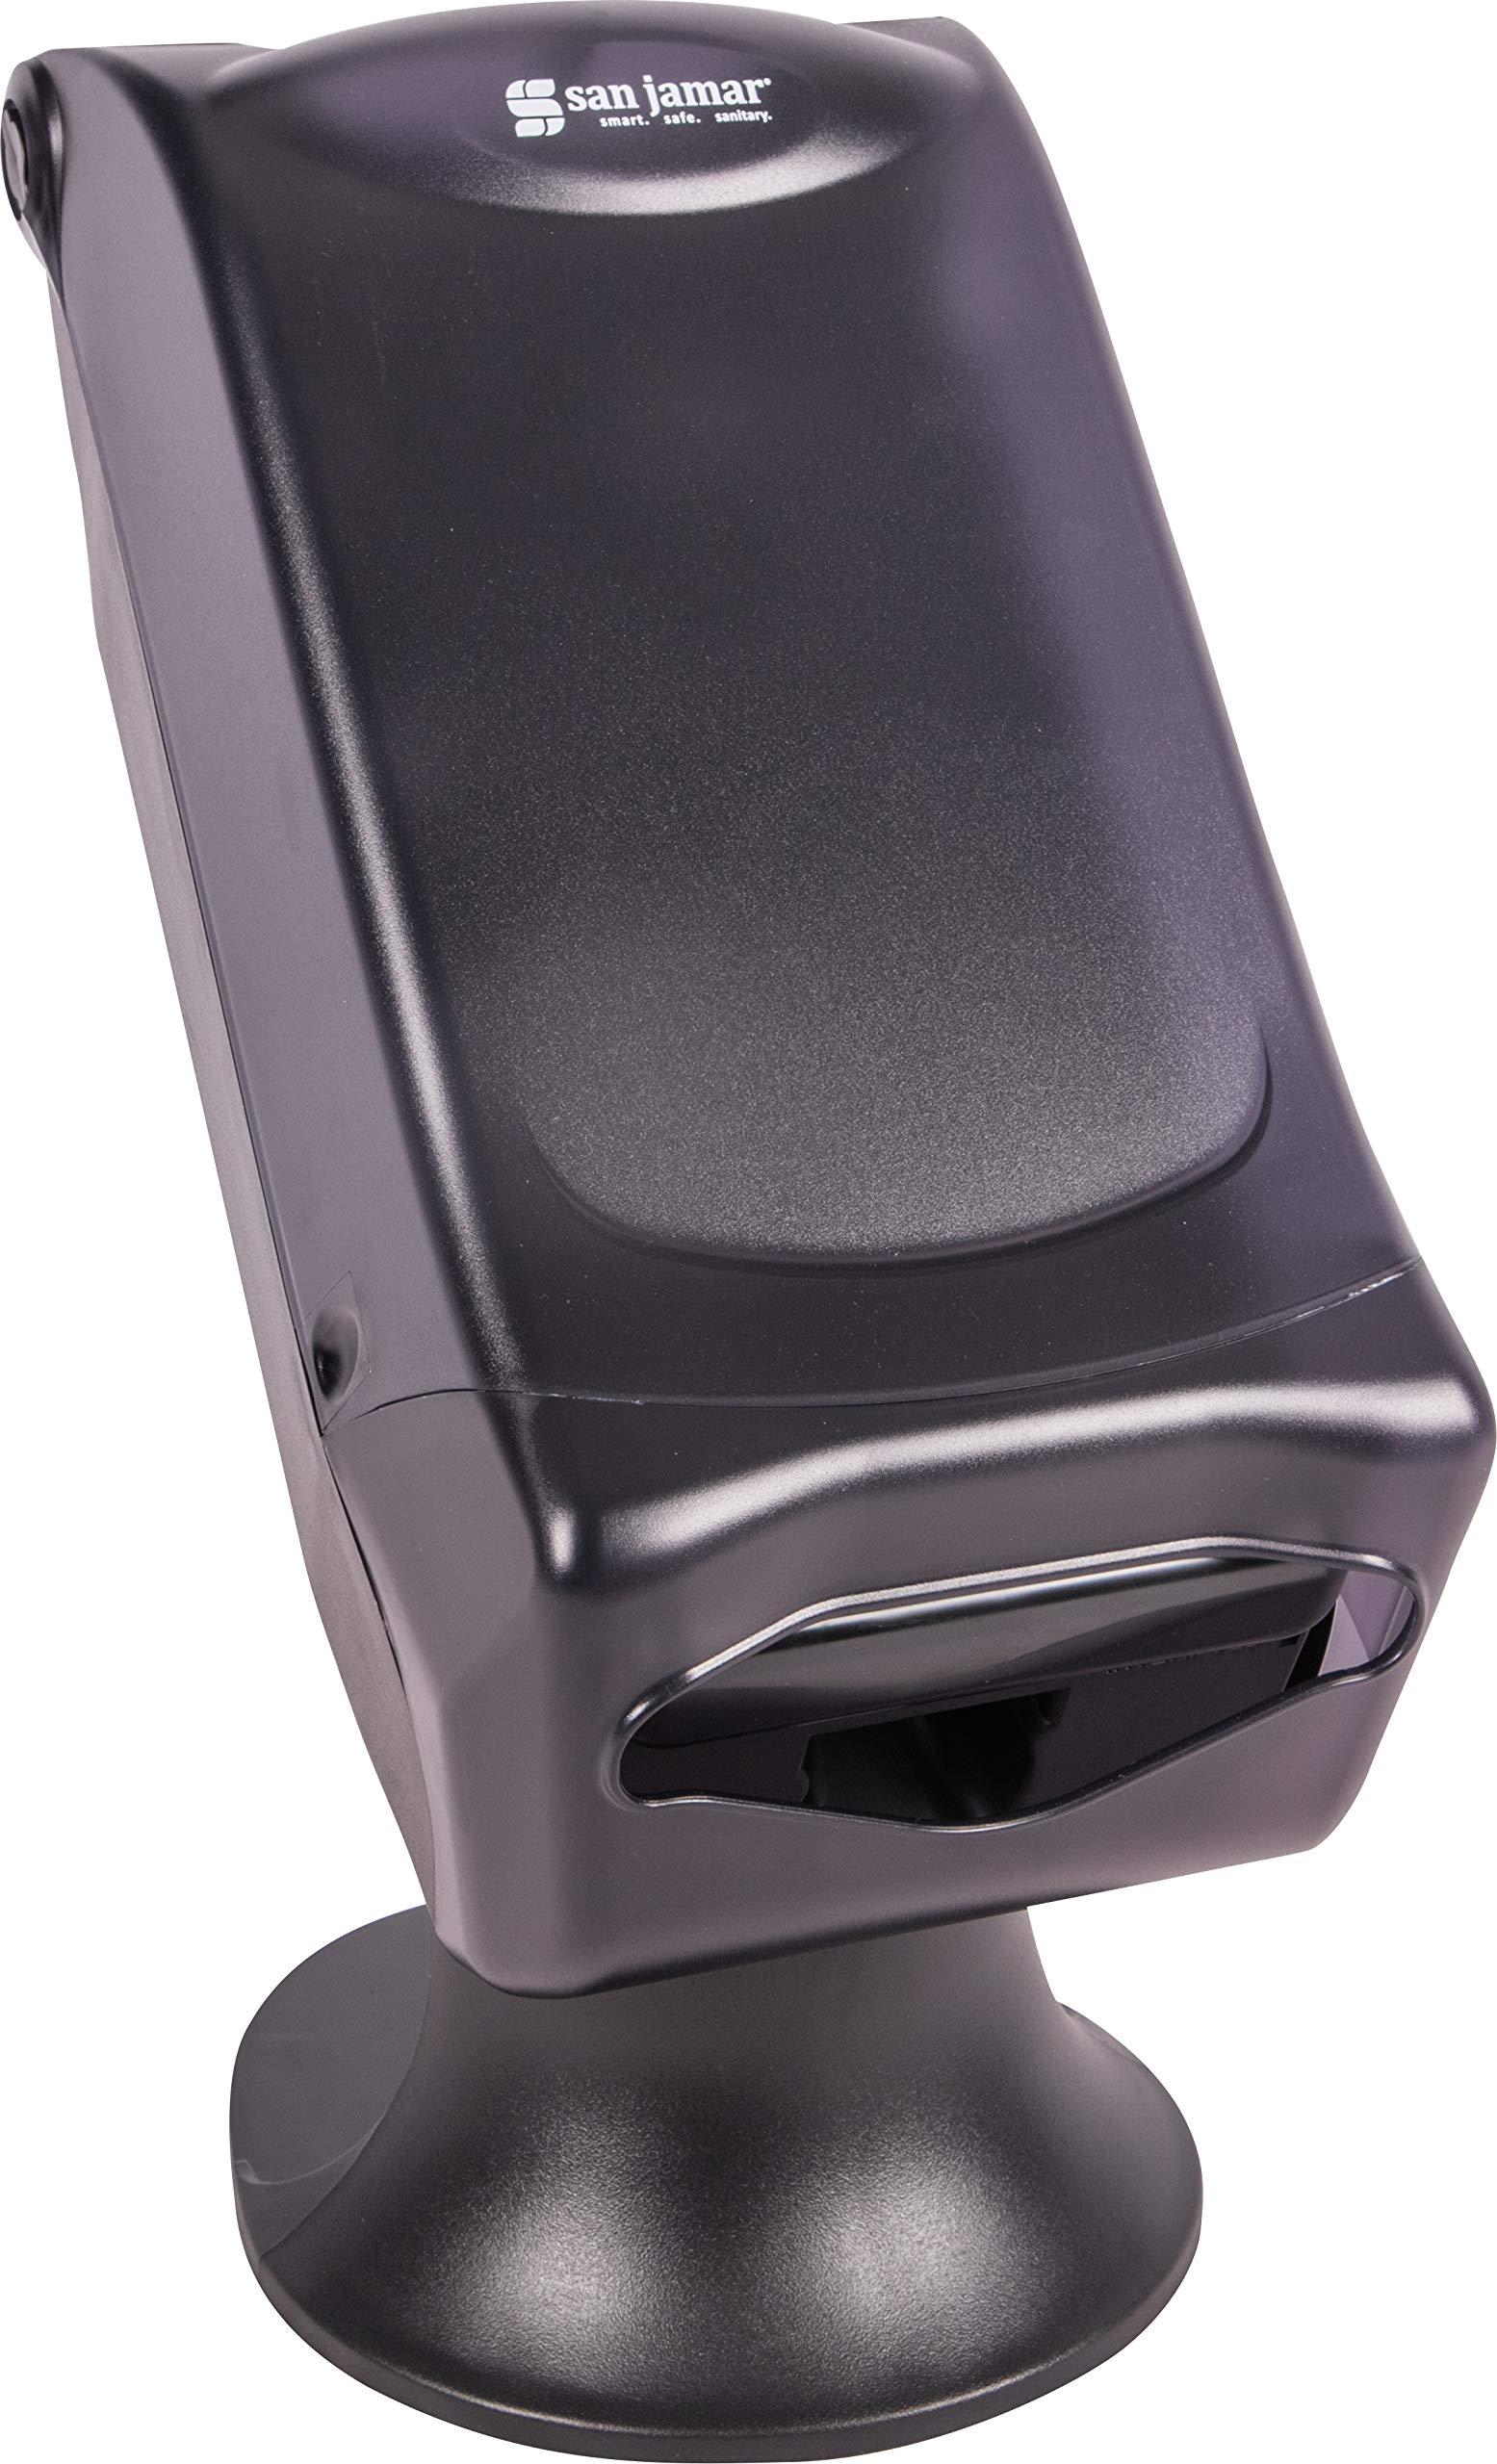 San Jamar H5005S Venue Fullfold Control Napkin Dispenser with Stand, 500 Capacity, 8'' Width x 17-1/2'' Height x 13'' Depth, Black Pearl by San Jamar (Image #3)